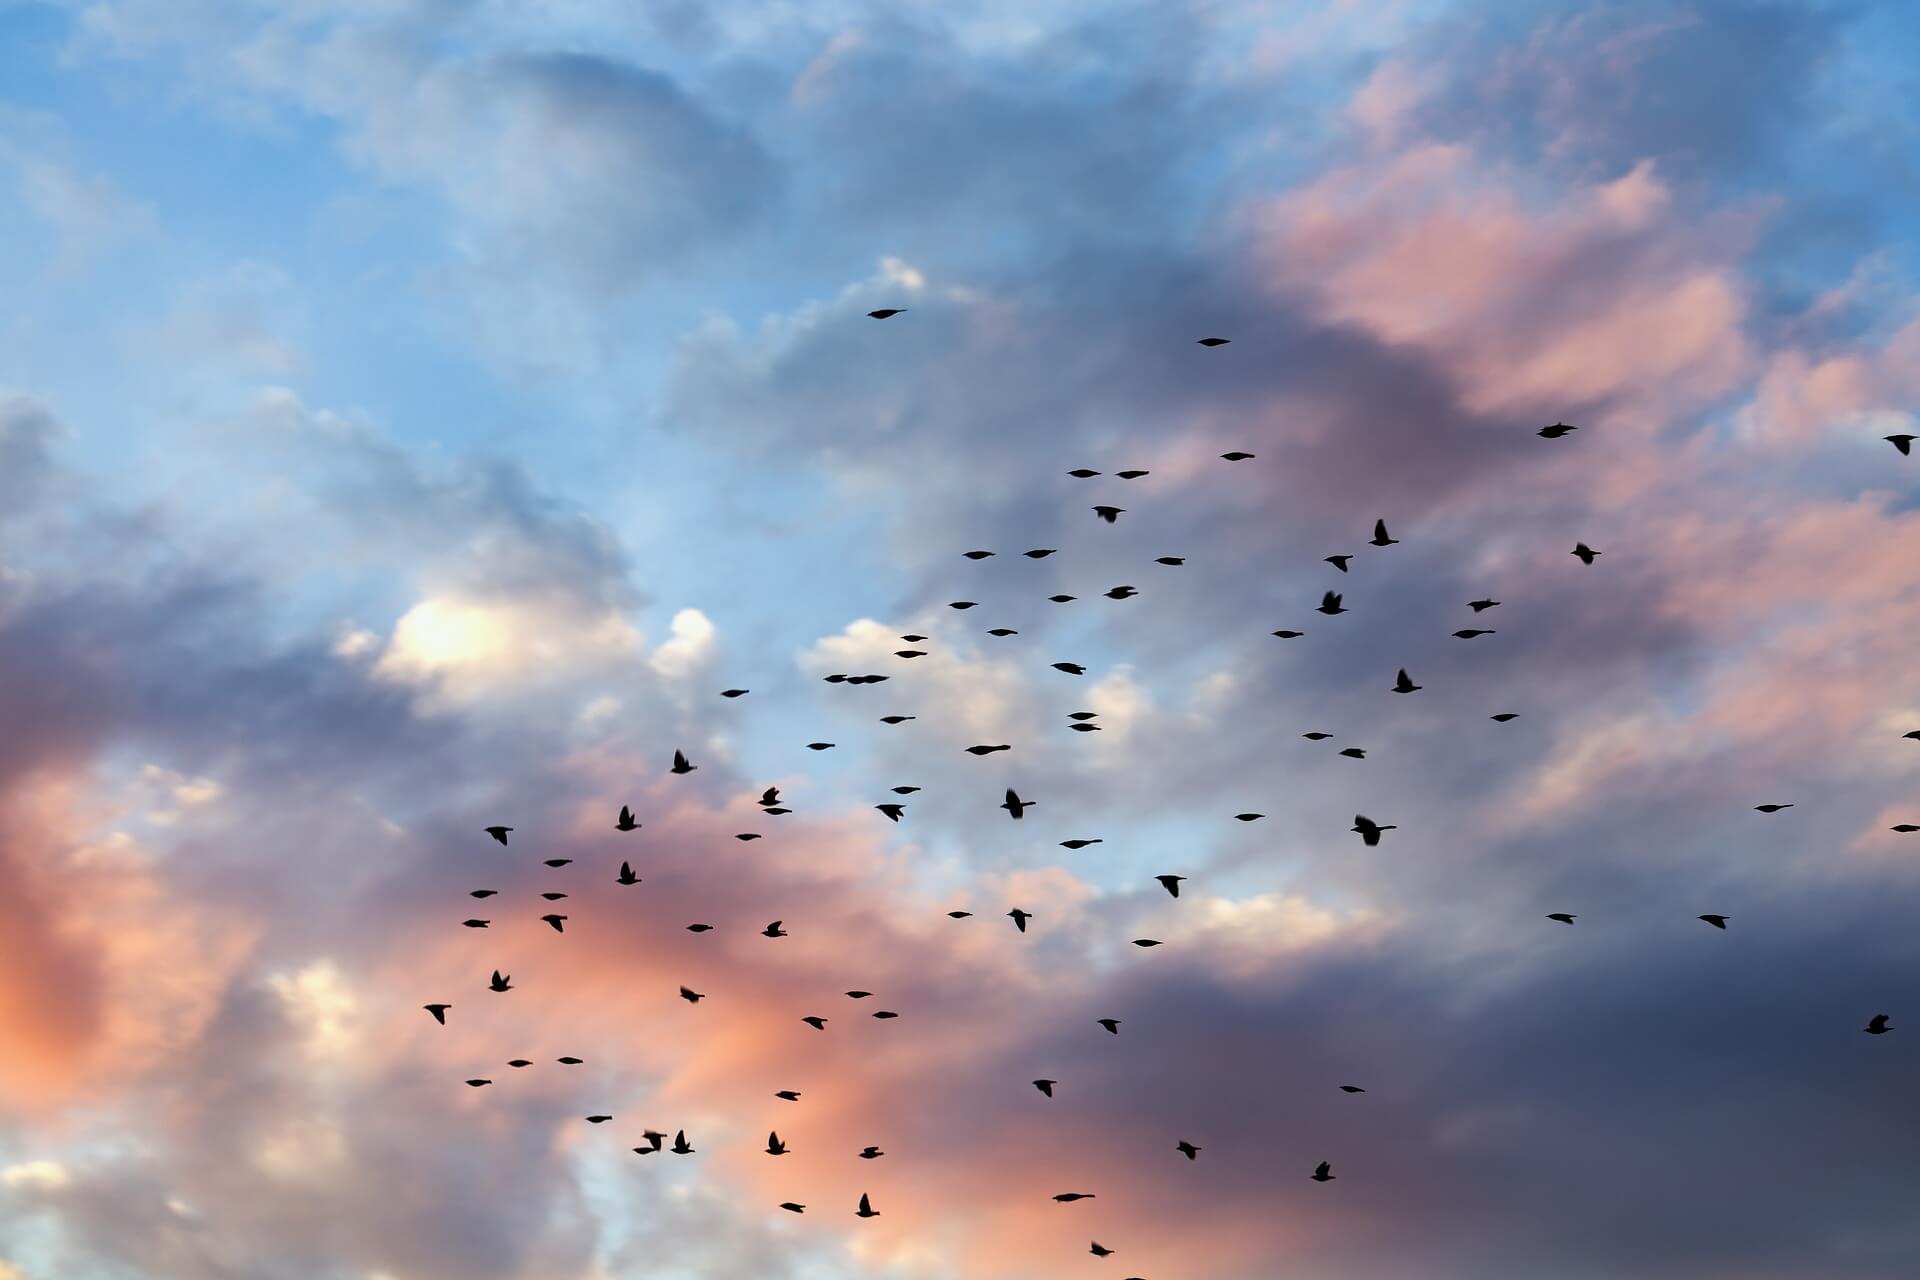 Birds Flying in a beautifully lit sky.